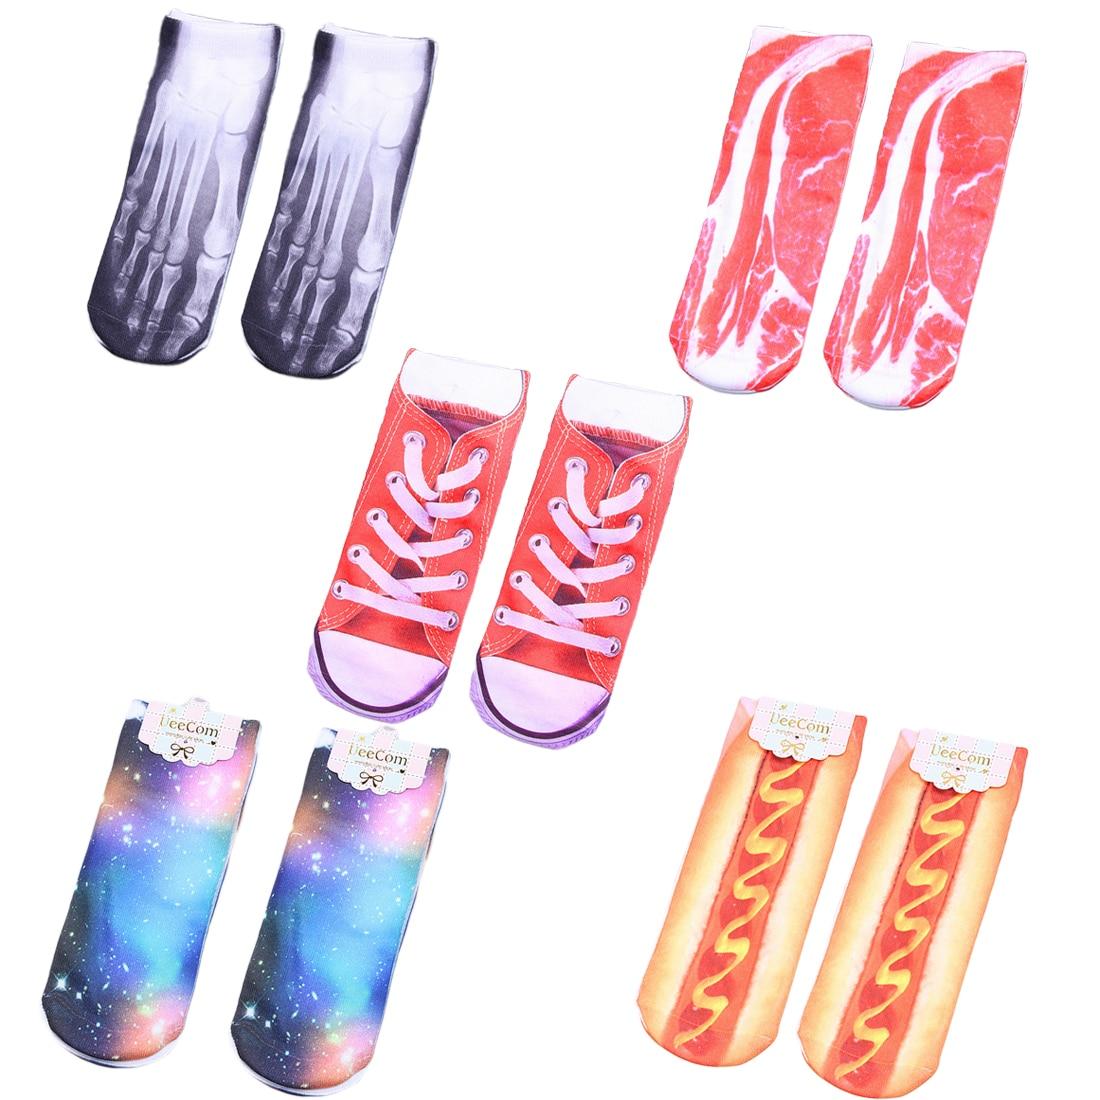 Hallowee Kawaii   Socks   New Short Boat   Sock   Happy Pair   Socks   Funny Skeleton Meat Cartoon Men Women Colorful Ankle